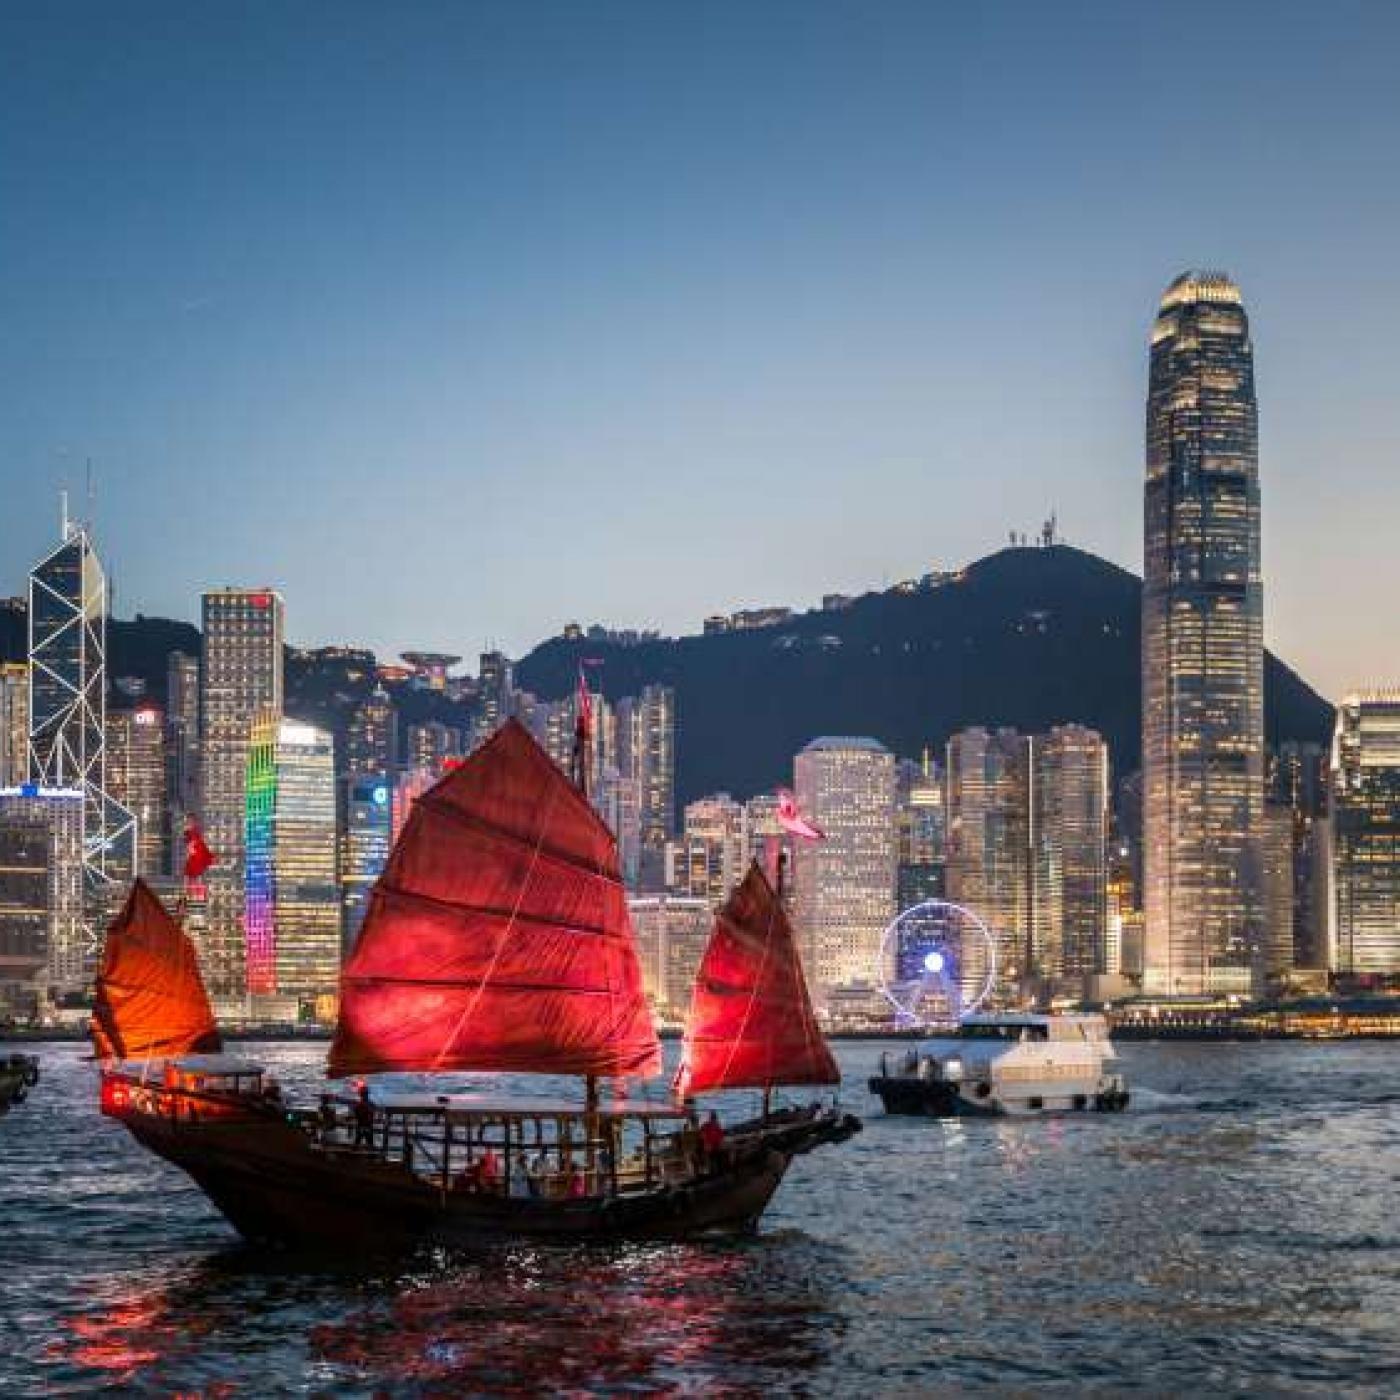 Règles strictes anti coronavirus à Hong Kong : Nicolas - 01 12 2020 - StereoChic Radio